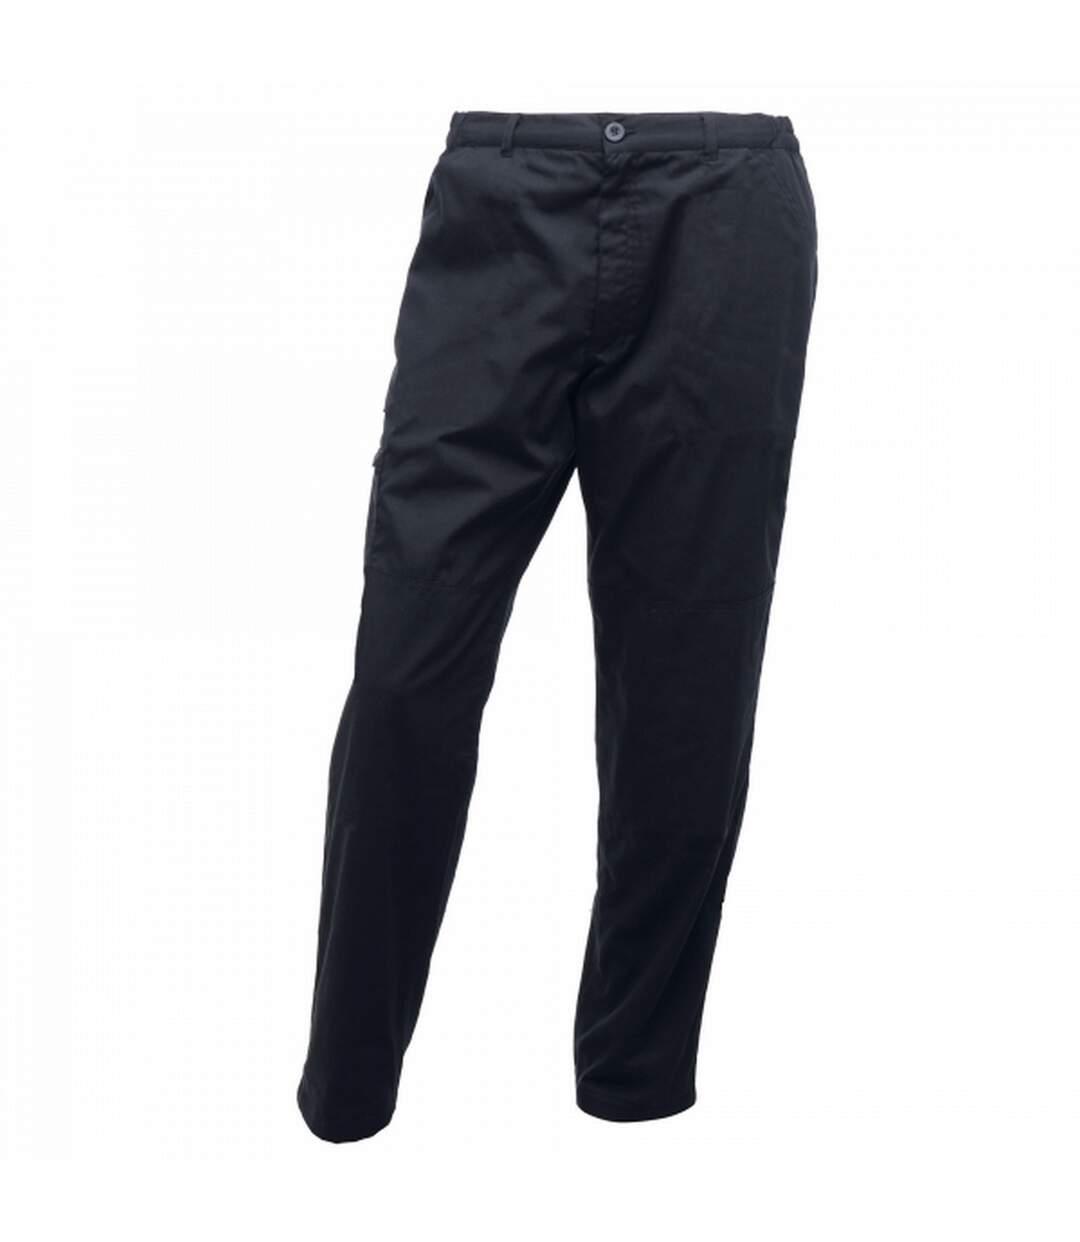 Regatta - Pantalon Pro Cargo - Homme (Gris) - UTRG3750